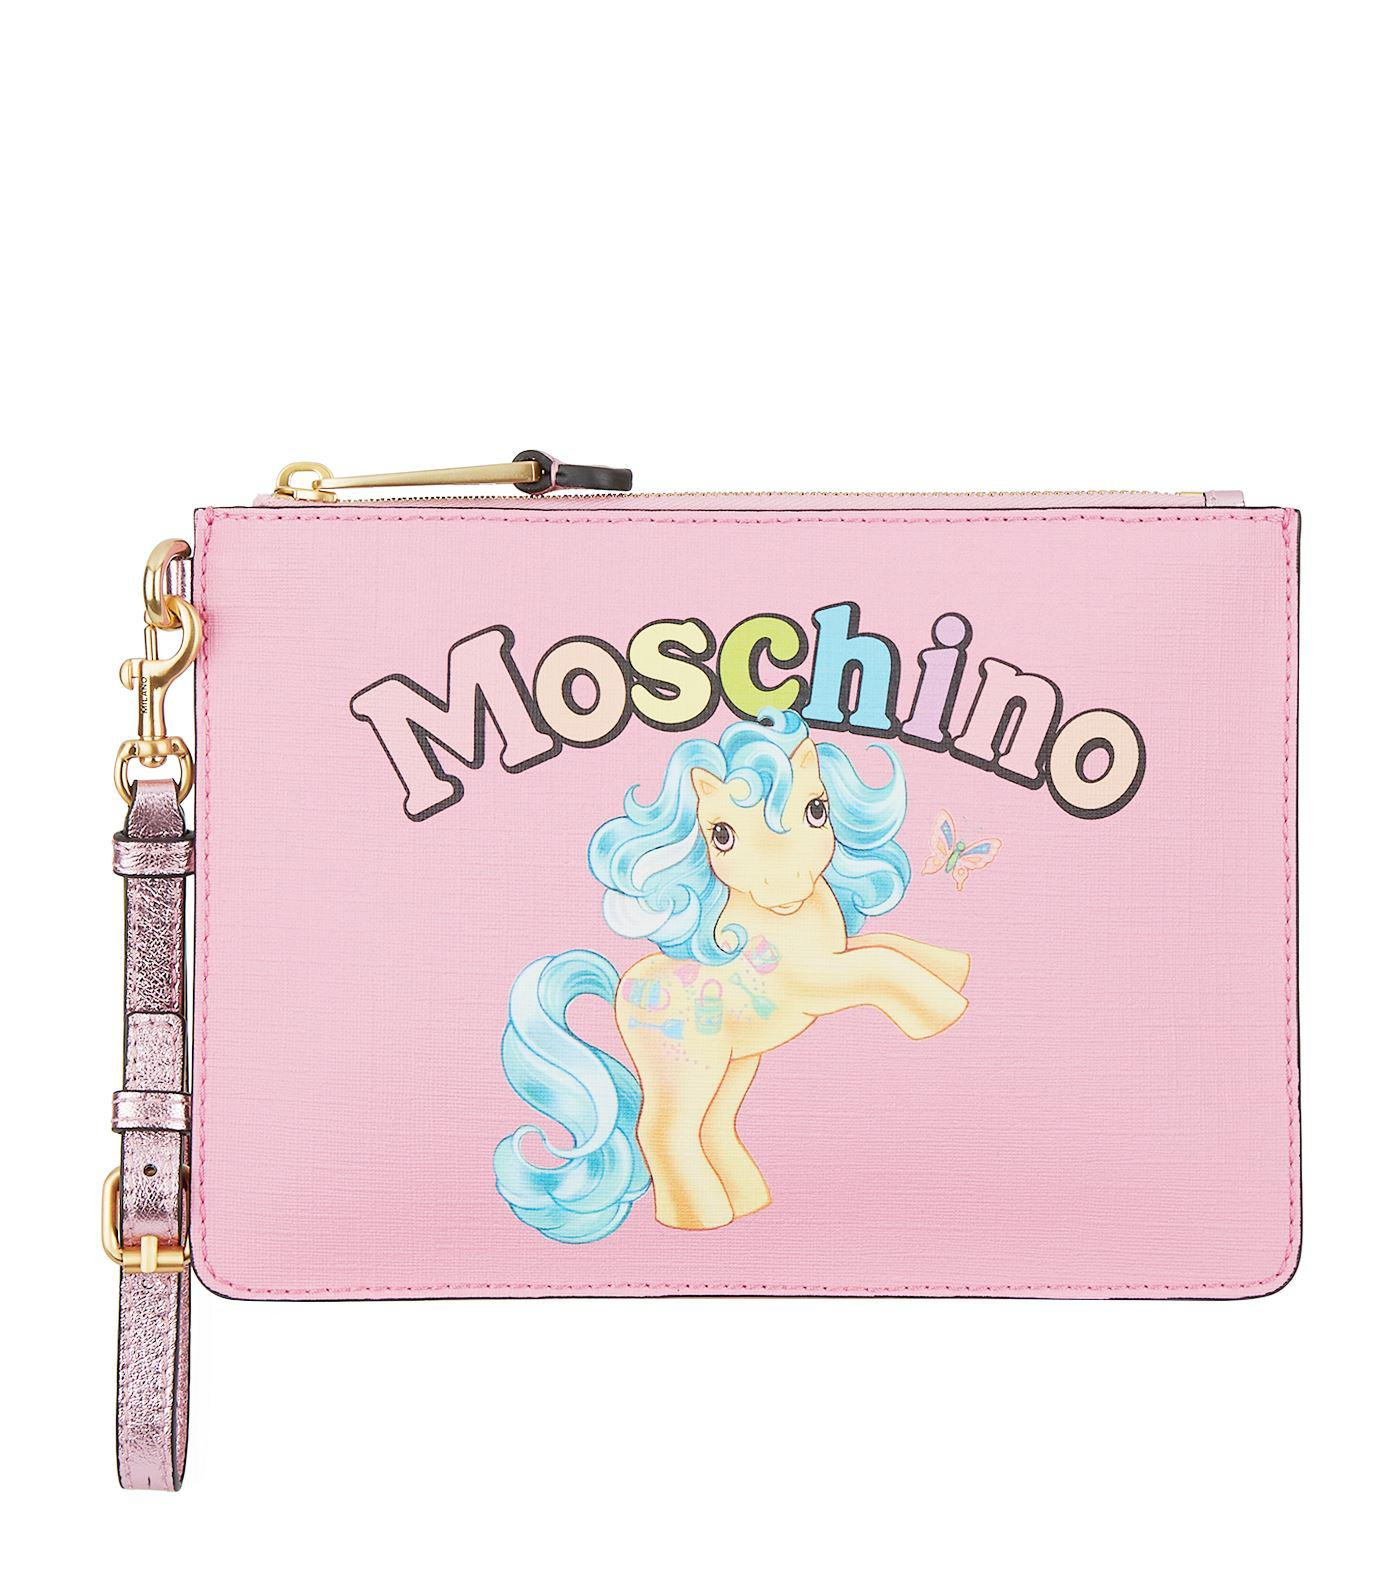 60a7dae1f8f moschino-Pink-My-Little-Pony-Printed-Clutch-Bag.jpeg